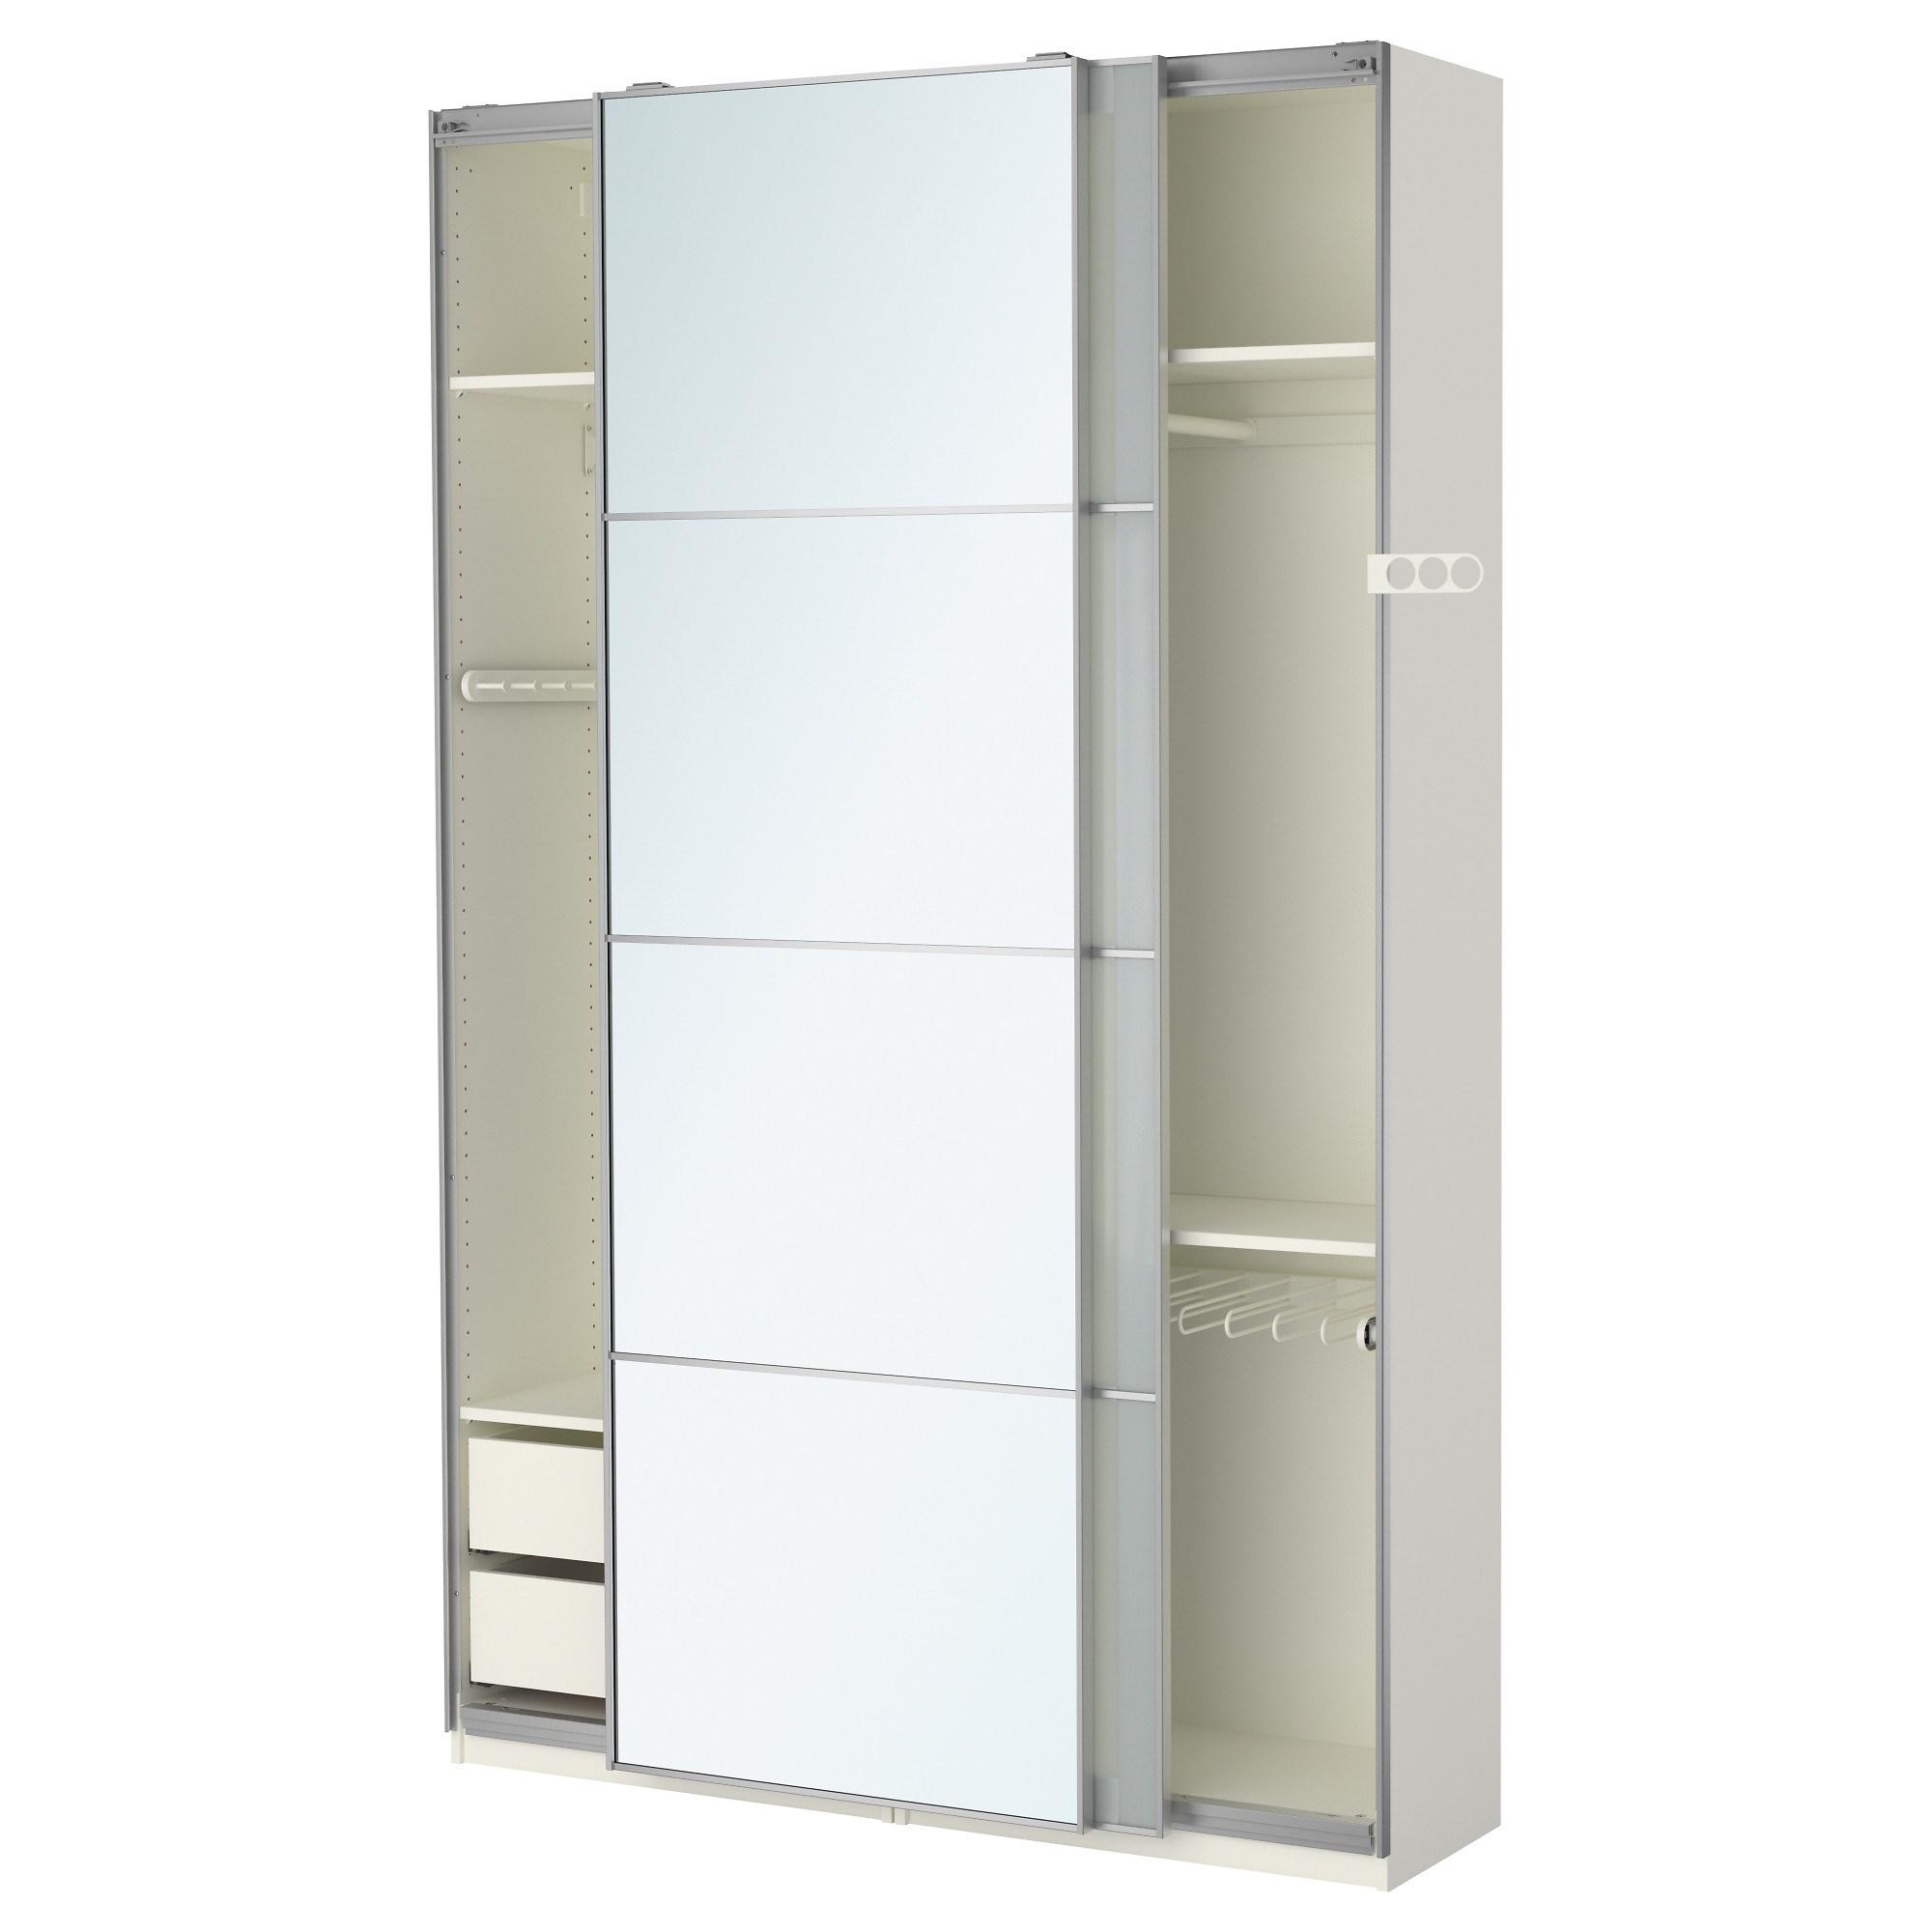 pax sekken sliding door wardrobe white mirror 150x44x236 cm ikea